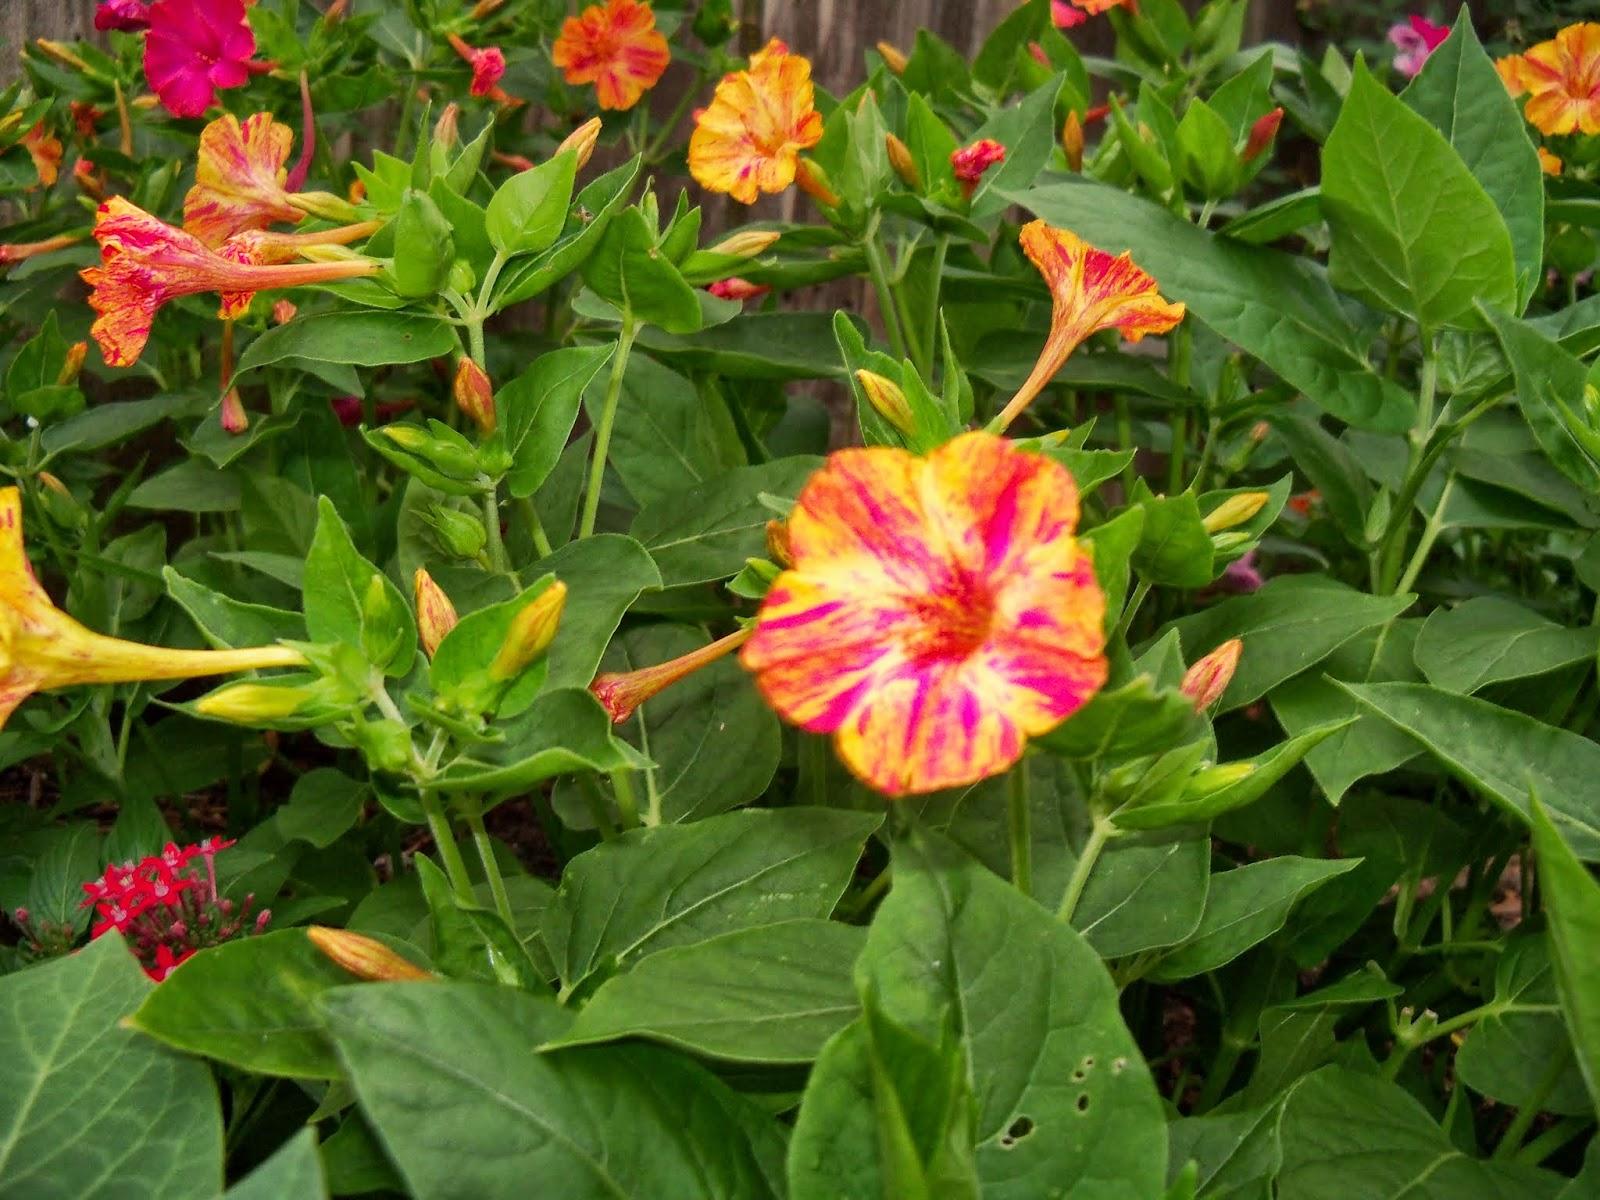 Gardening 2014 - 116_1954.JPG